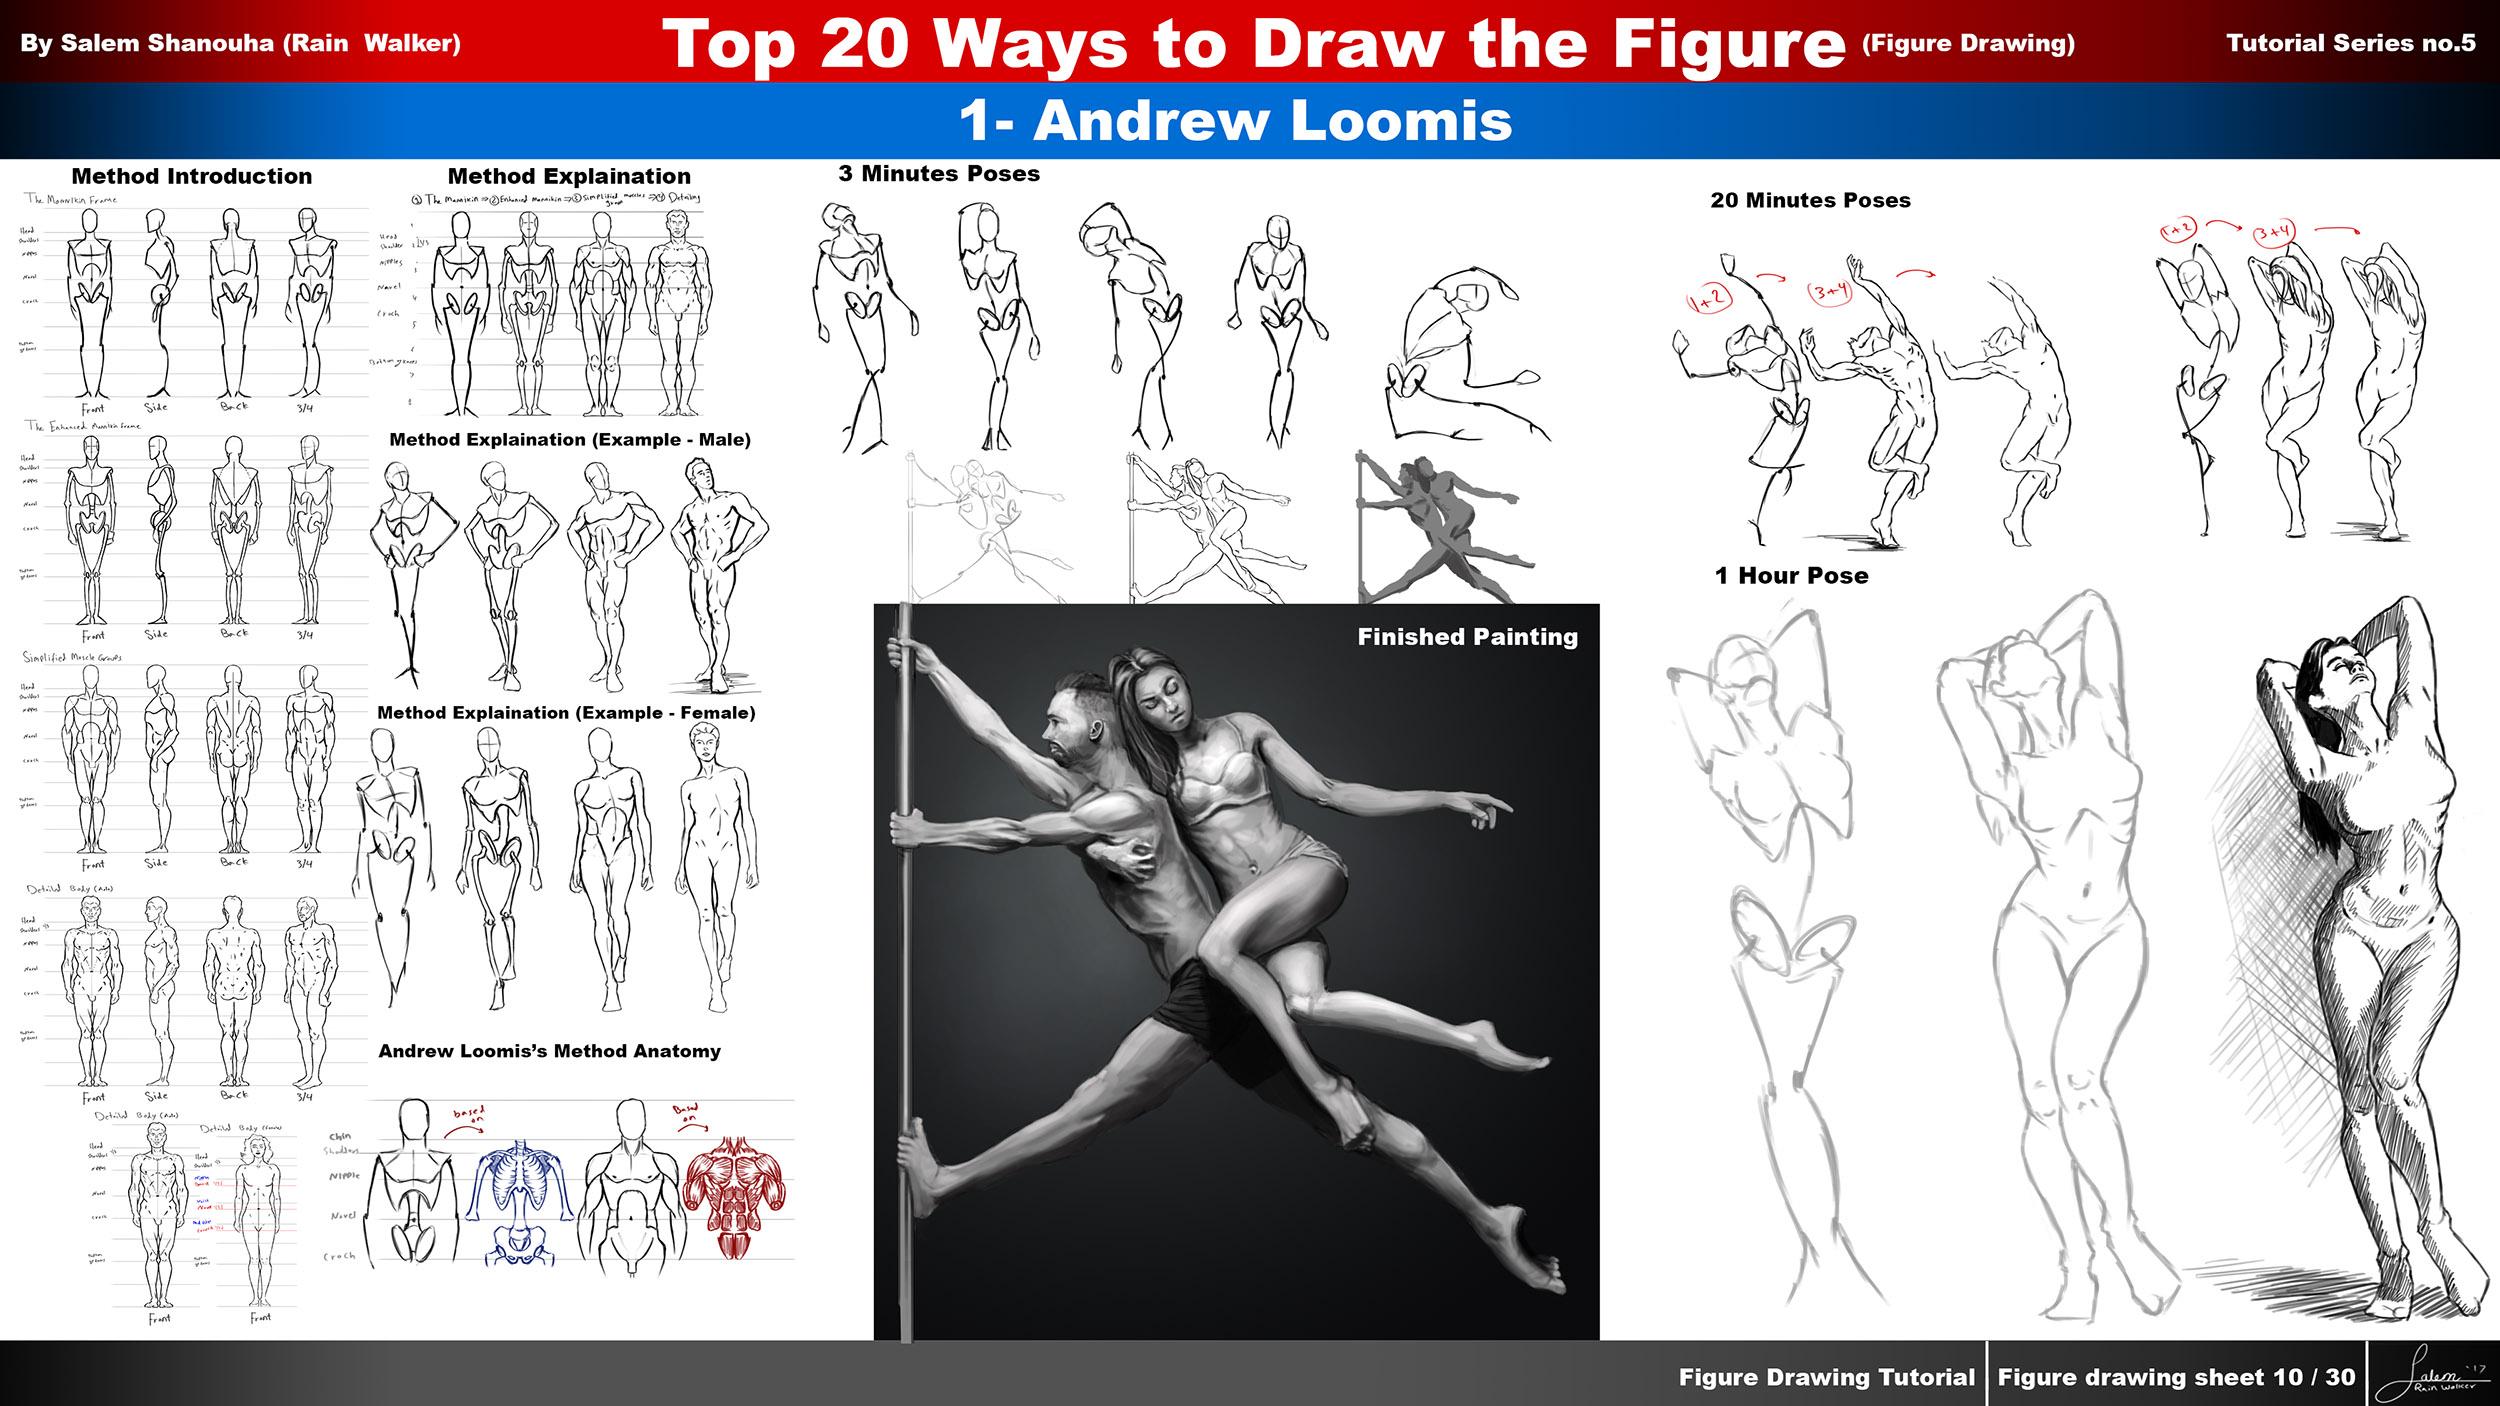 Top 20 Ways to Draw the Figure Tutorial Series (Ch.1 Andrew Loomis Method)